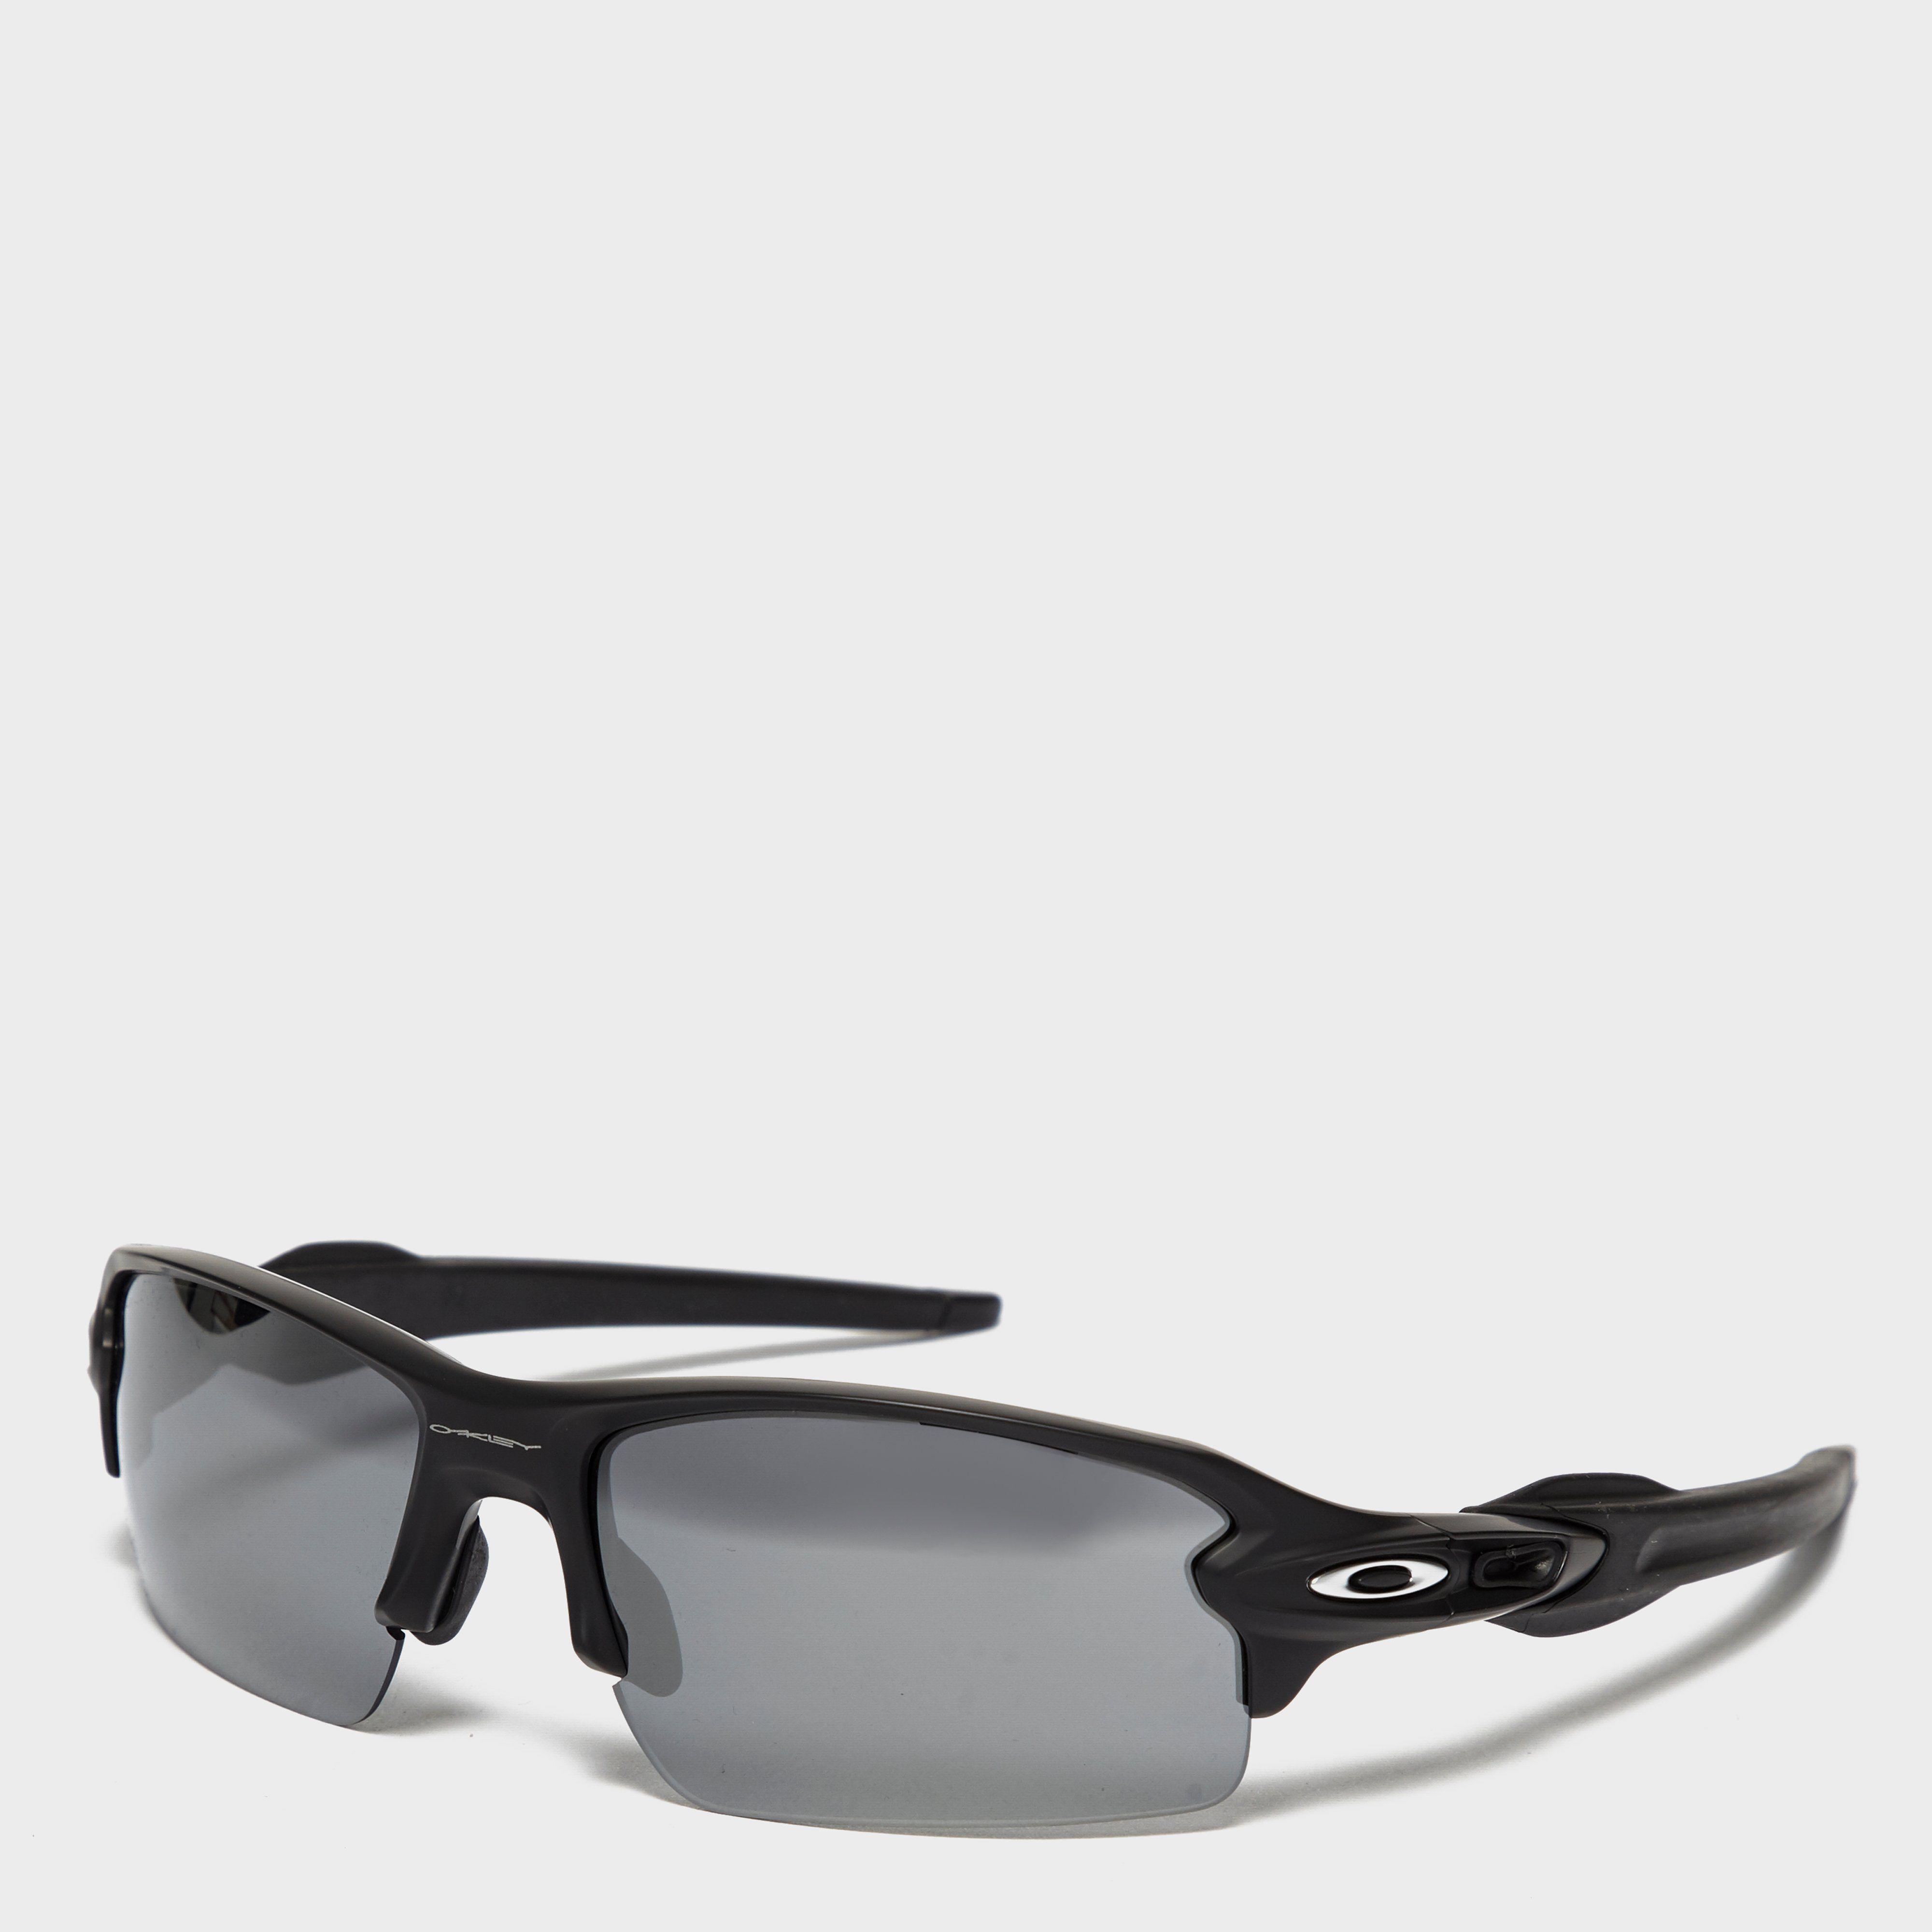 OAKLEY Flak™ 2.0 Black Iridium Sunglasses